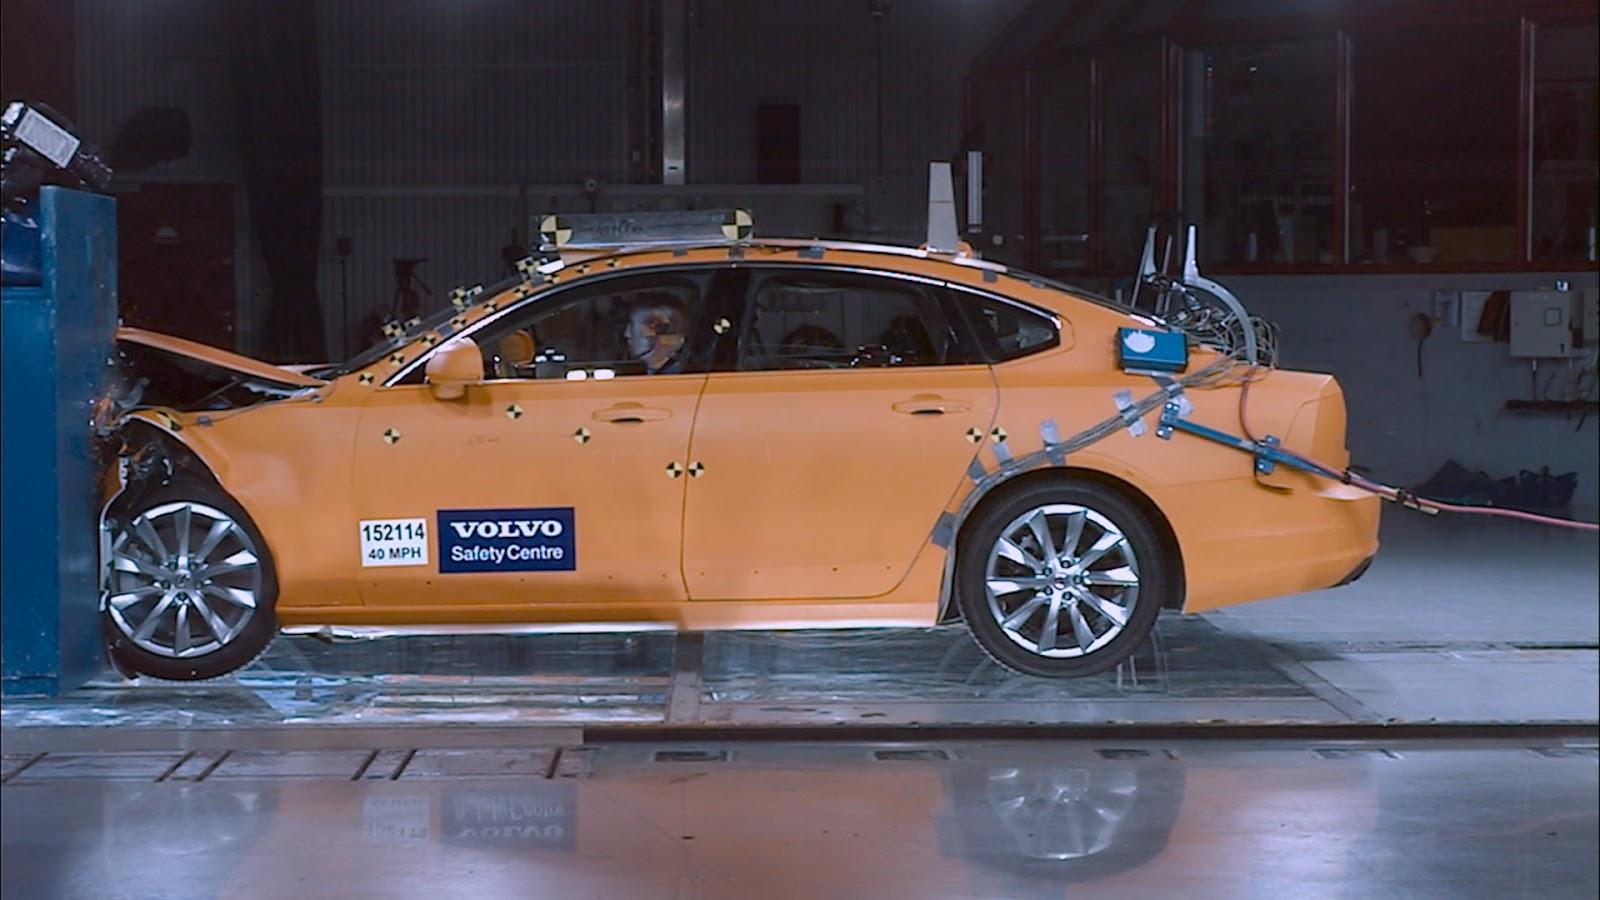 172074 Volvo S90 Small Overlap Crash Test 20 χρόνια Volvo Cars Safety Centre : Δύο δεκαετίες, σώζει ζωές